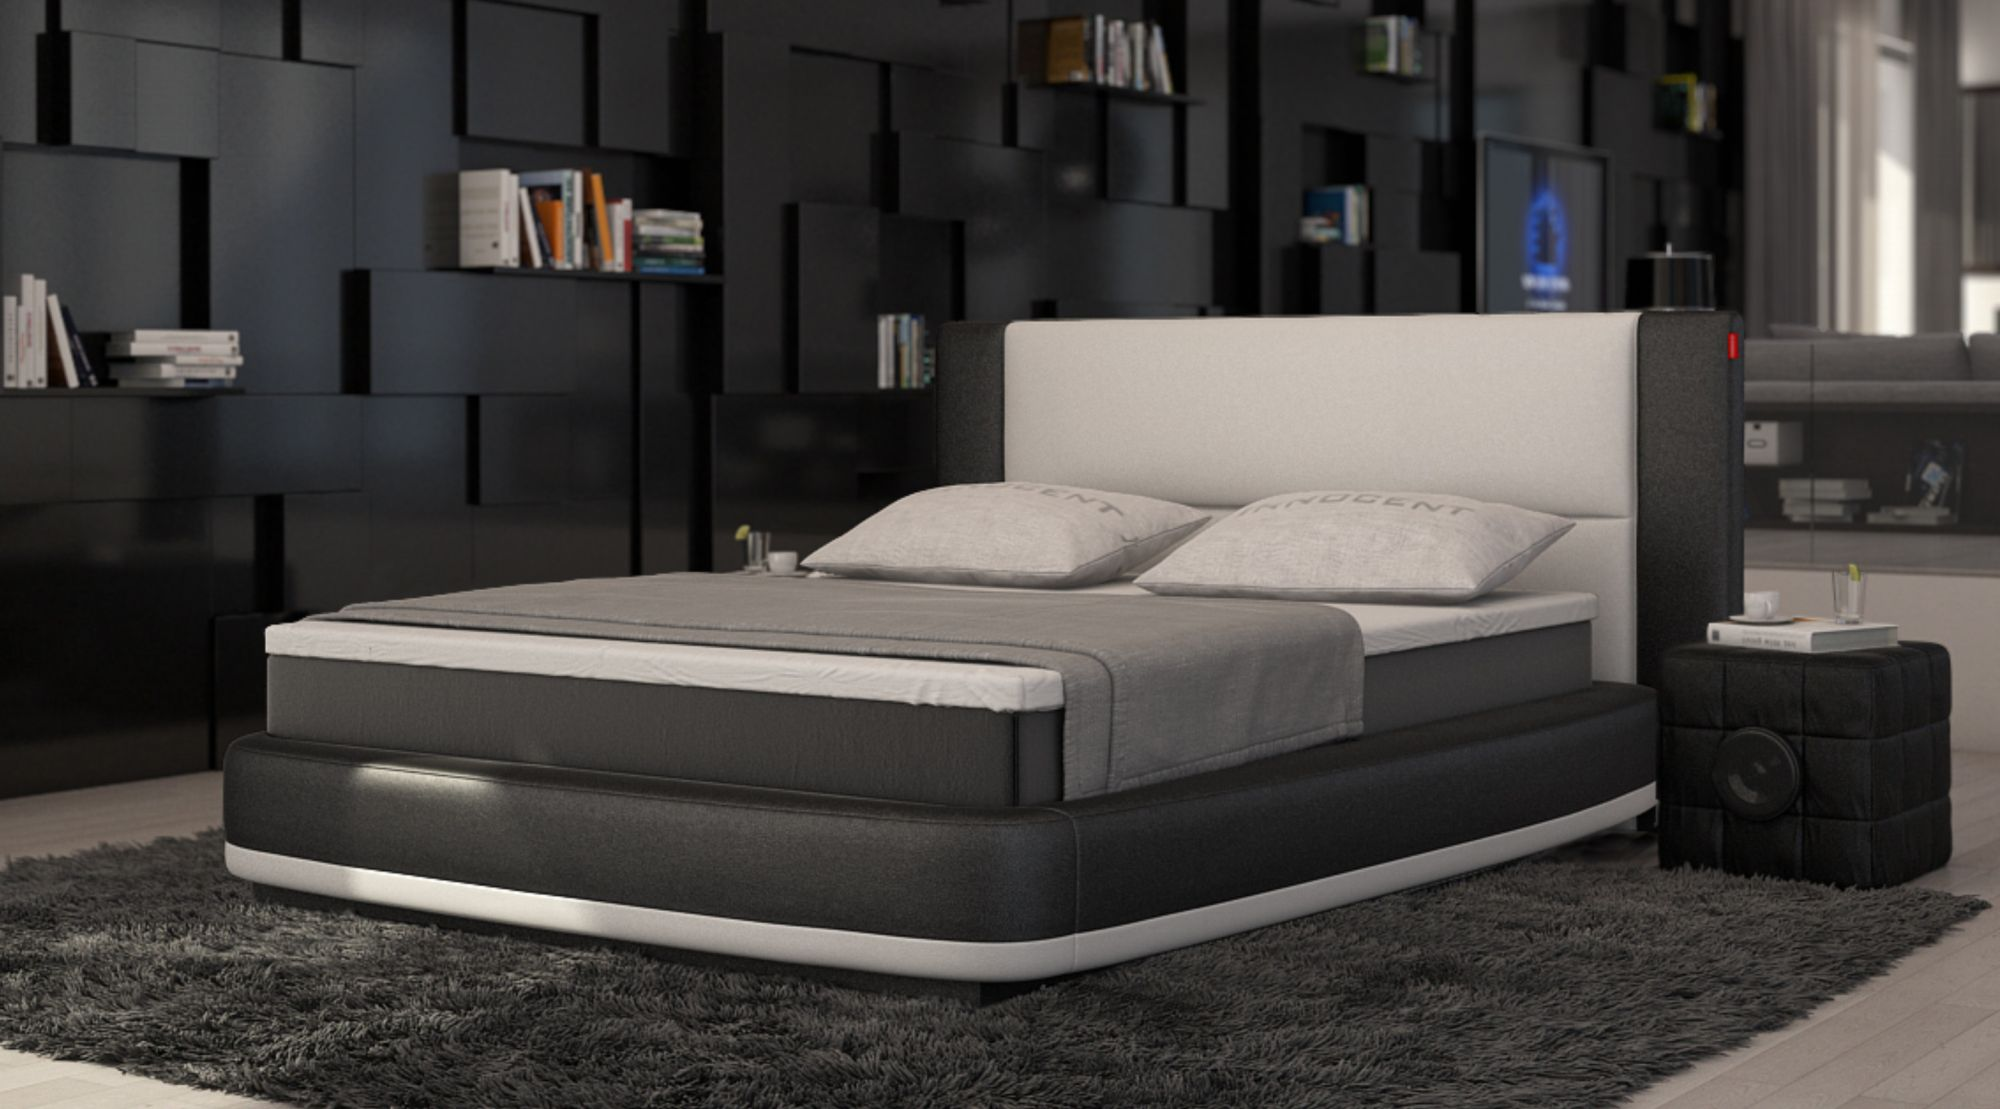 boxspring bett aquila design polsterbett designerbett zweifarbig ebay. Black Bedroom Furniture Sets. Home Design Ideas